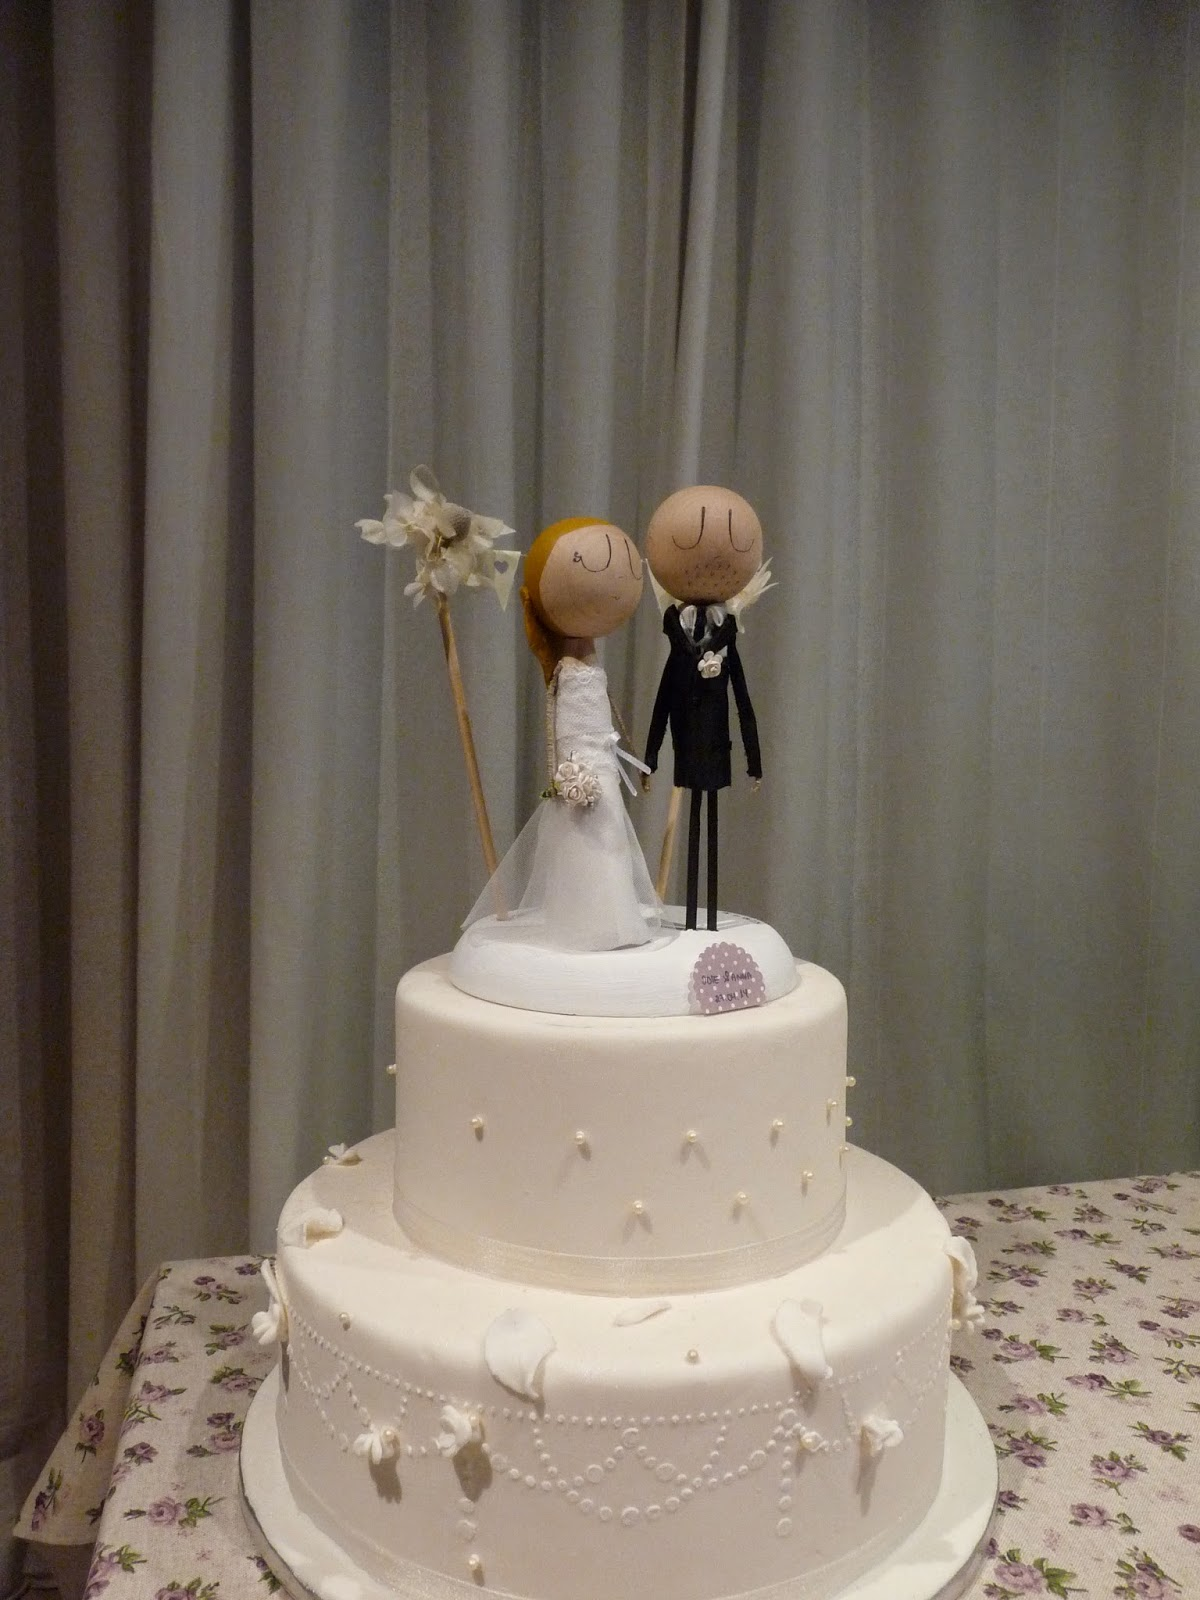 pronovias, novios pastel personalizados, figuras tarta, muñecos pastel, novios, novios originales, novios con encanto, wedding cake, topper cake, cake topper, bride,novia, novio, vestido novia, muñecos pastel personalizados, tarta boda, pastel nupcial, prometidos, nos casamos, novios de pastel elegante, con encanto, maleta, viaje de novios, ramo de novia, peinado novia, corbata novio, restaurante bodas, mrymrsbyani, mr&mrsbyani, wedding topper cake, jordi anguera novias, jesus peiro